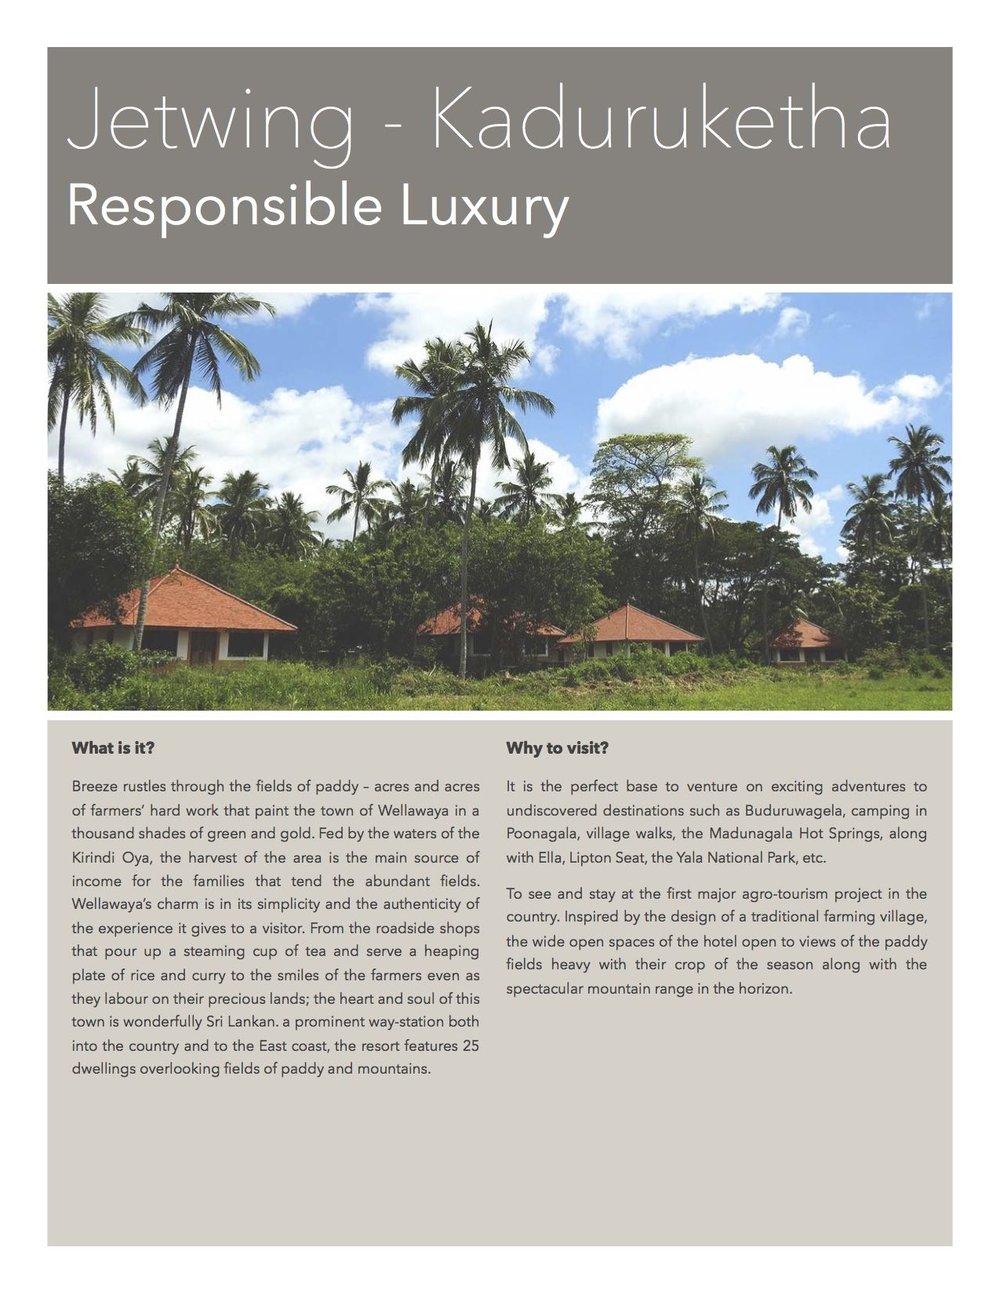 Jetwing Kaduruketha - Your stay in Wellawaya, Sri Lanka